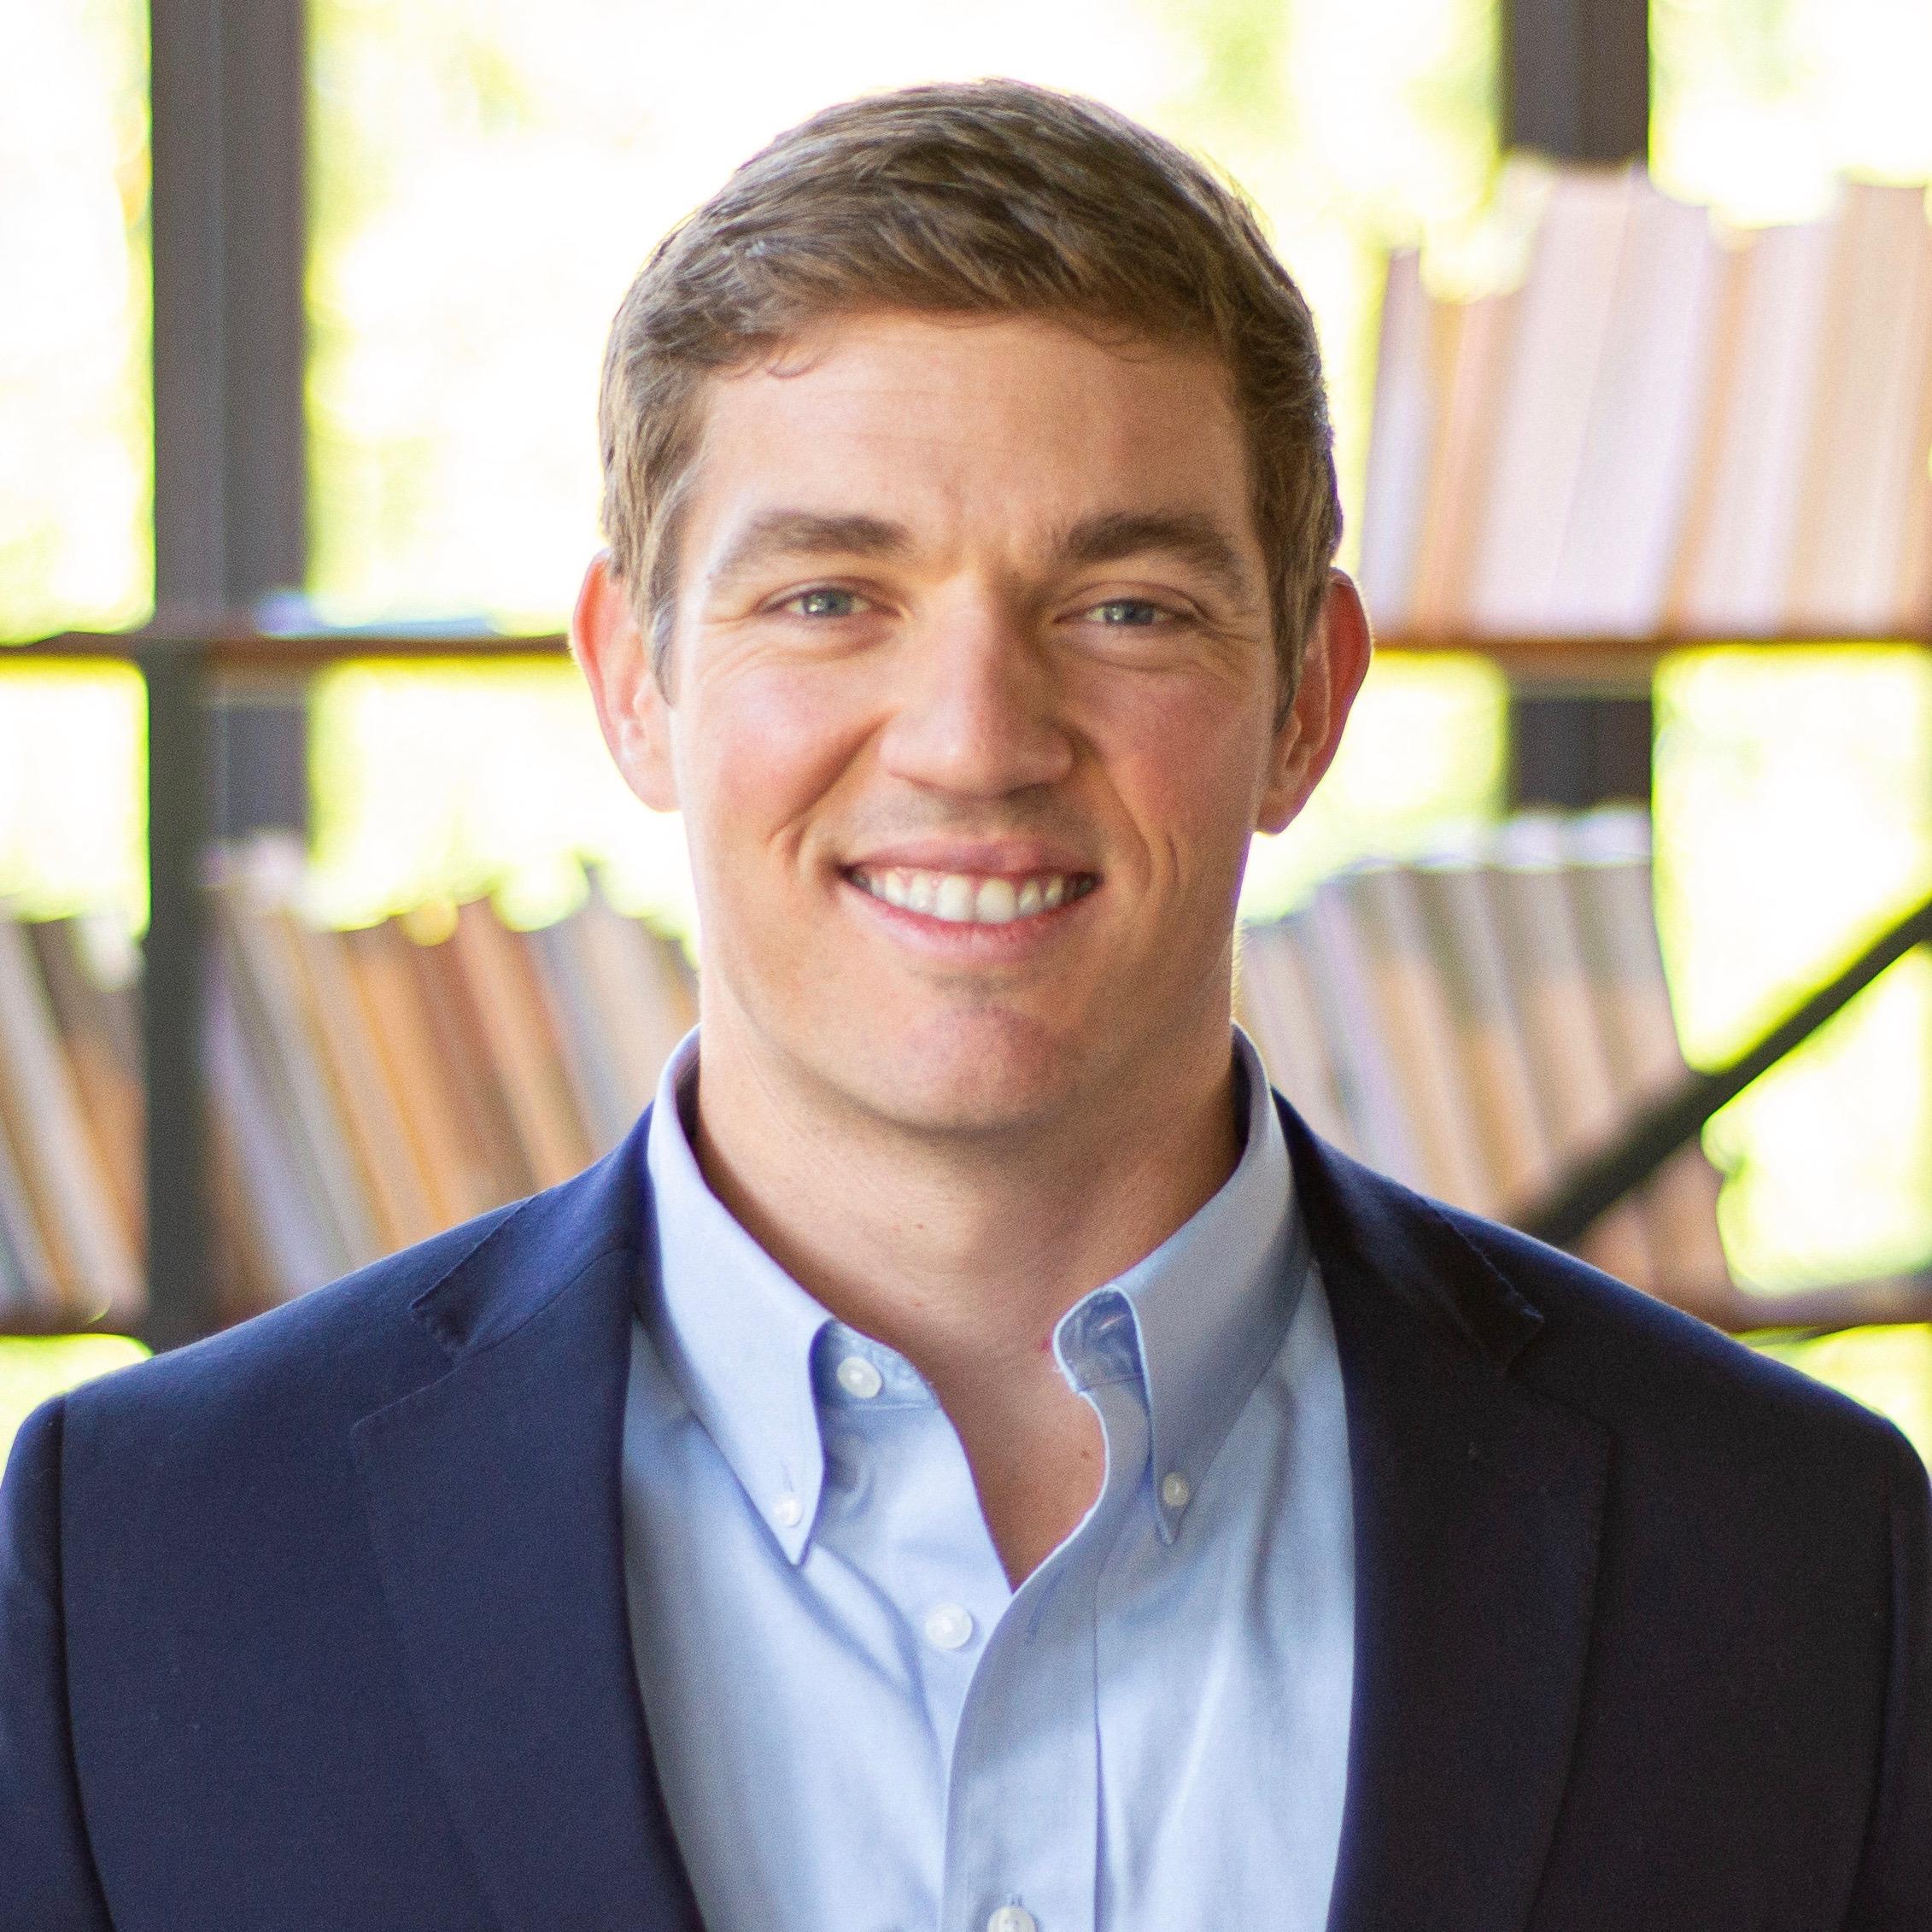 Blake Rogers - Associate Pastorblake@christcovenant.com